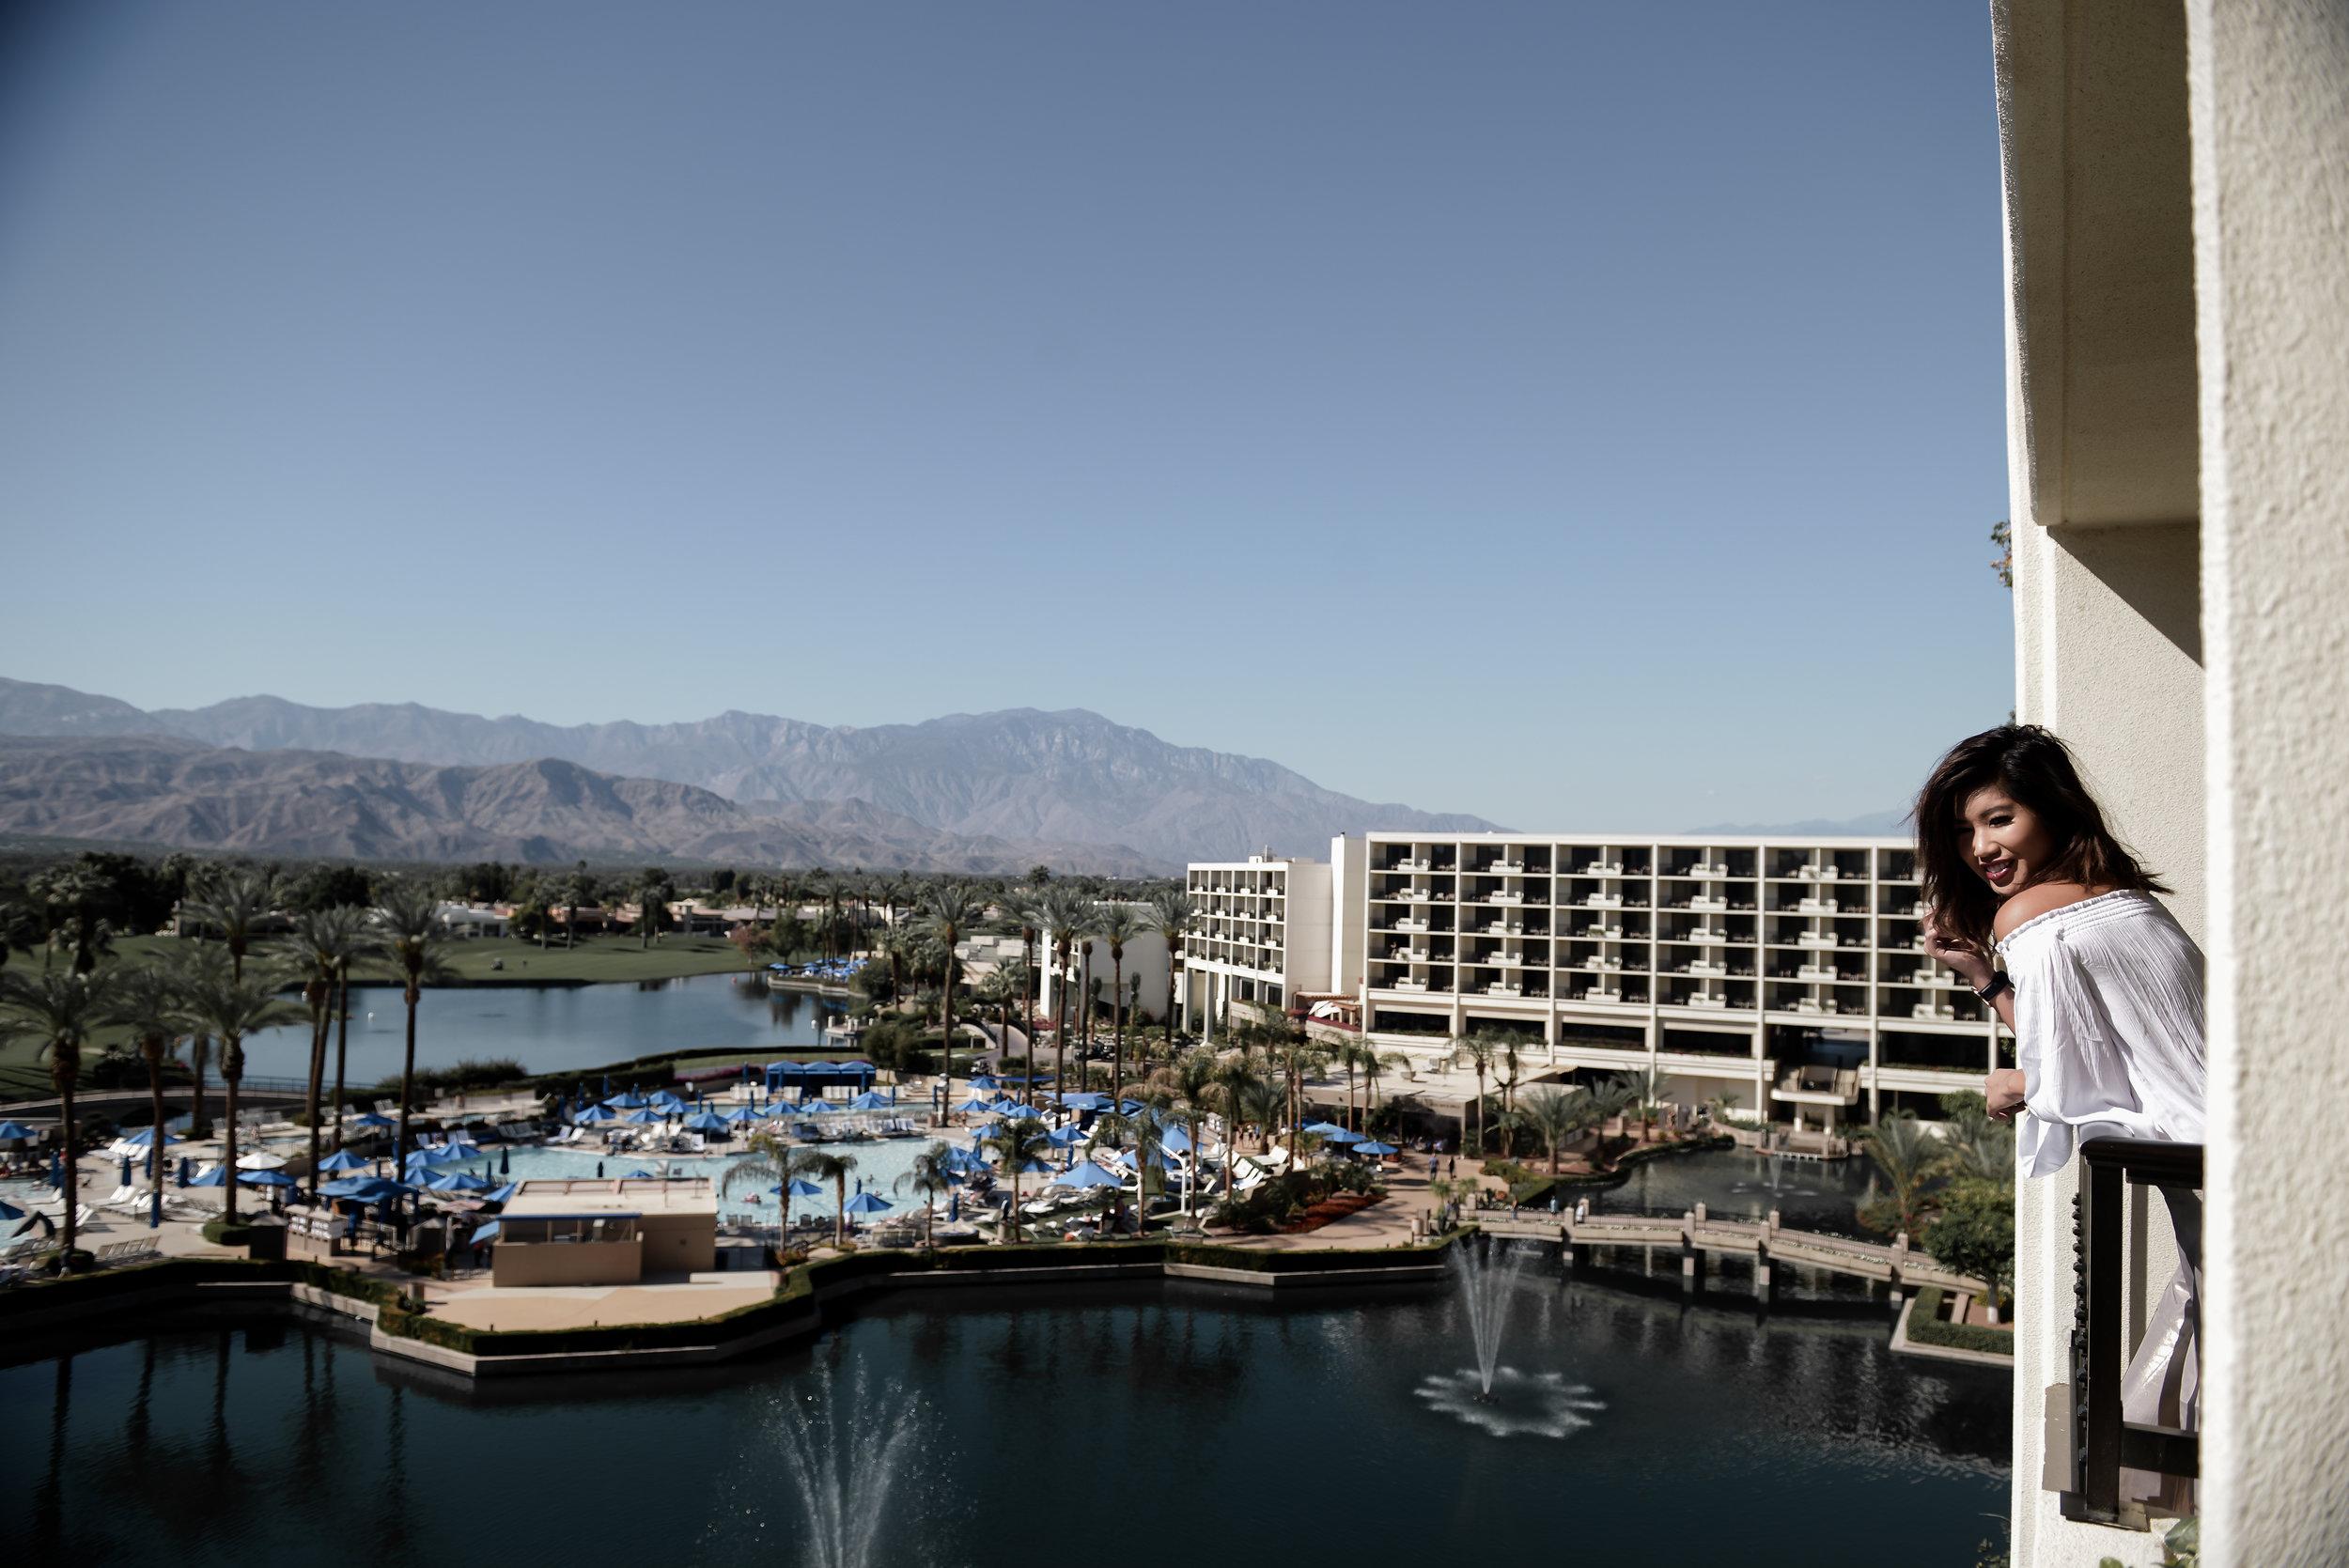 Marriott Desert Springs Balcony View by Lisa Linh